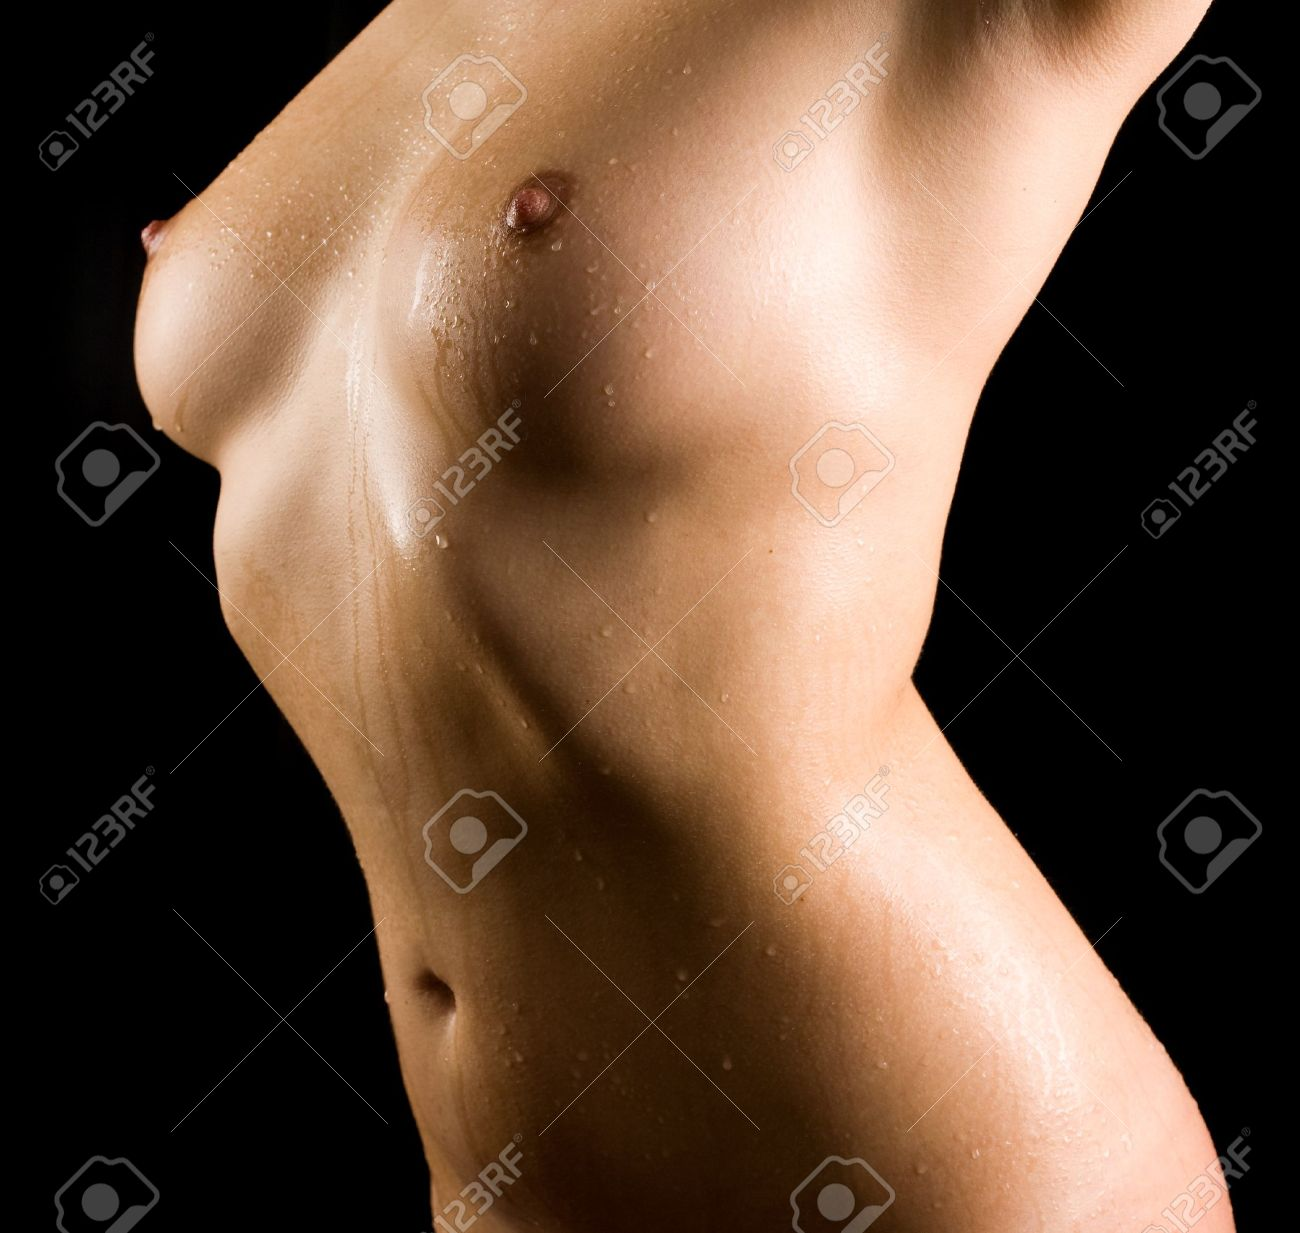 Dalia dippolito nude